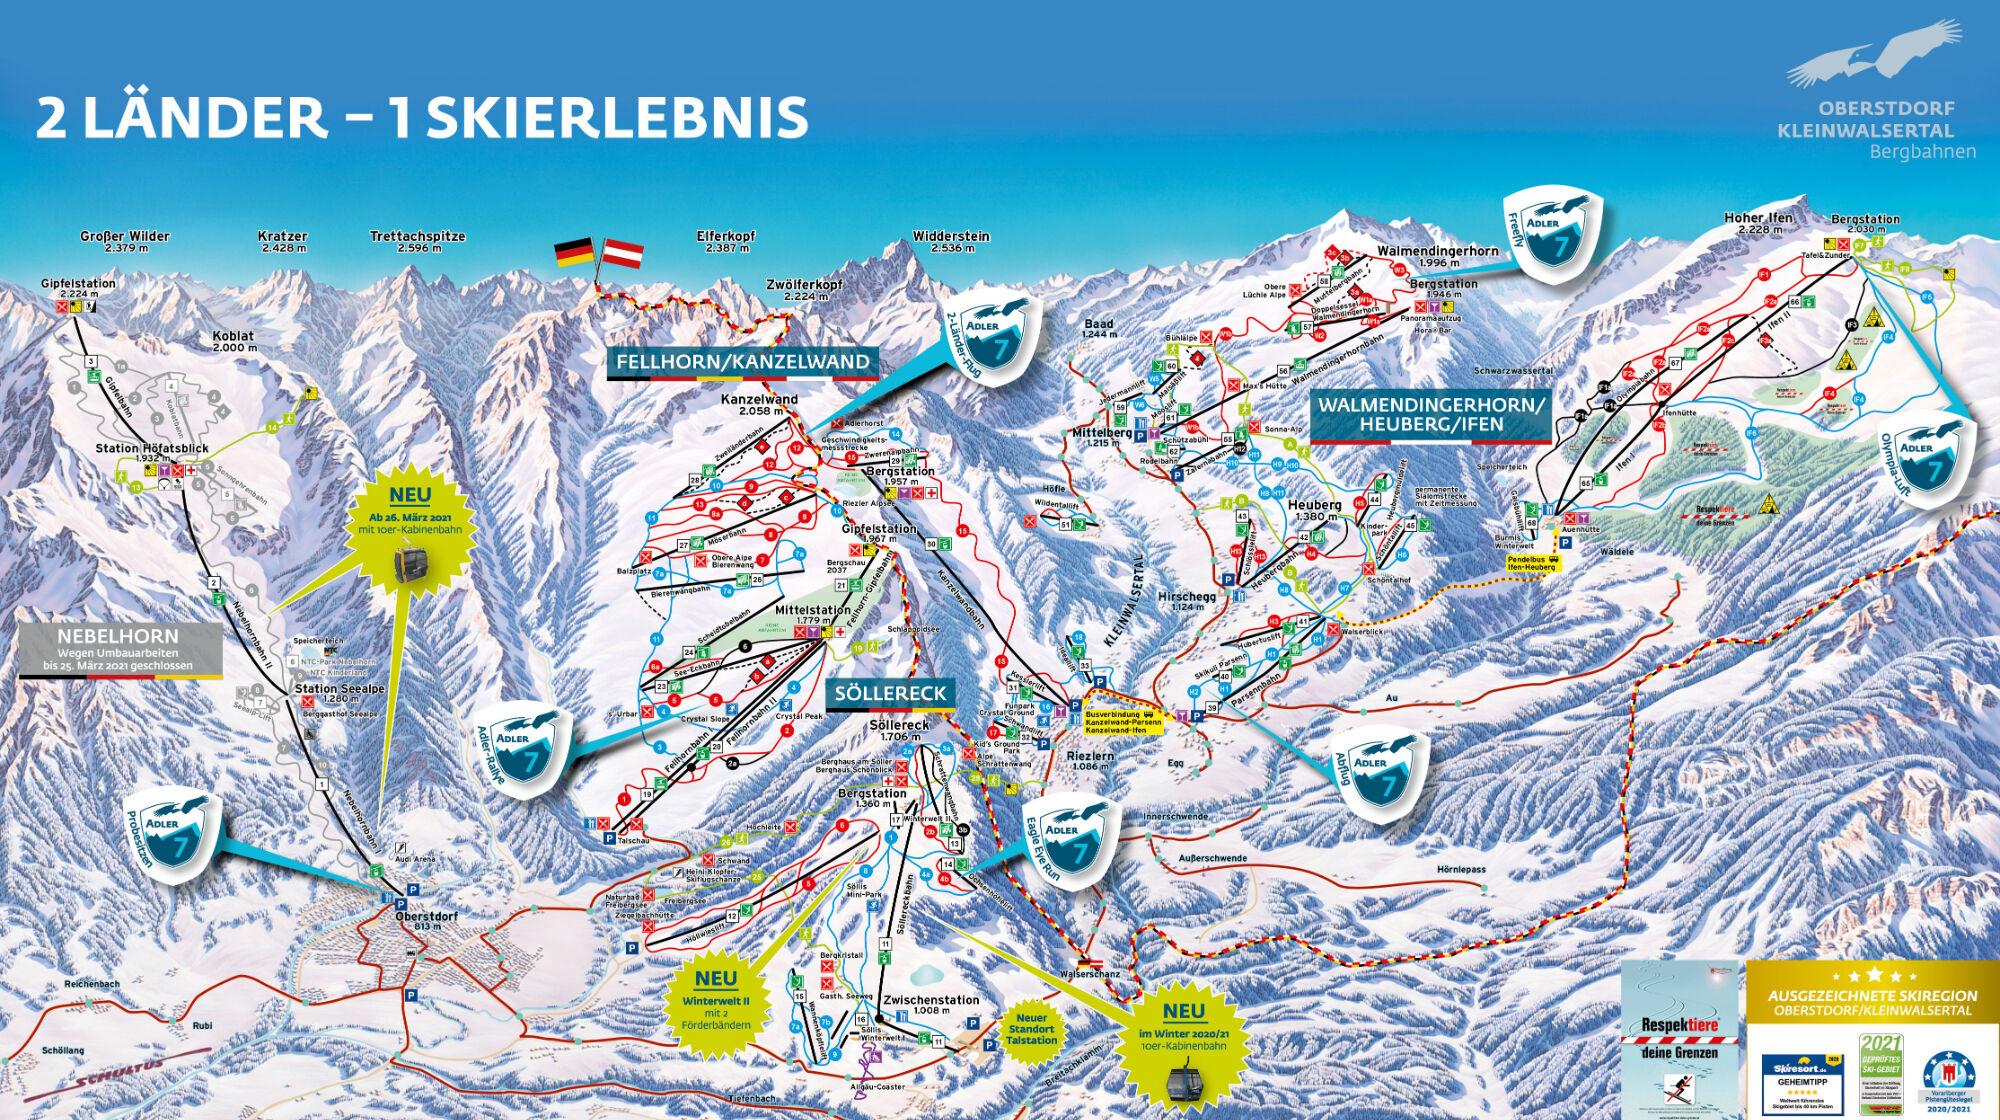 Panoramakarte Oberstdorf-Kleinwalsertal Bergbahnen